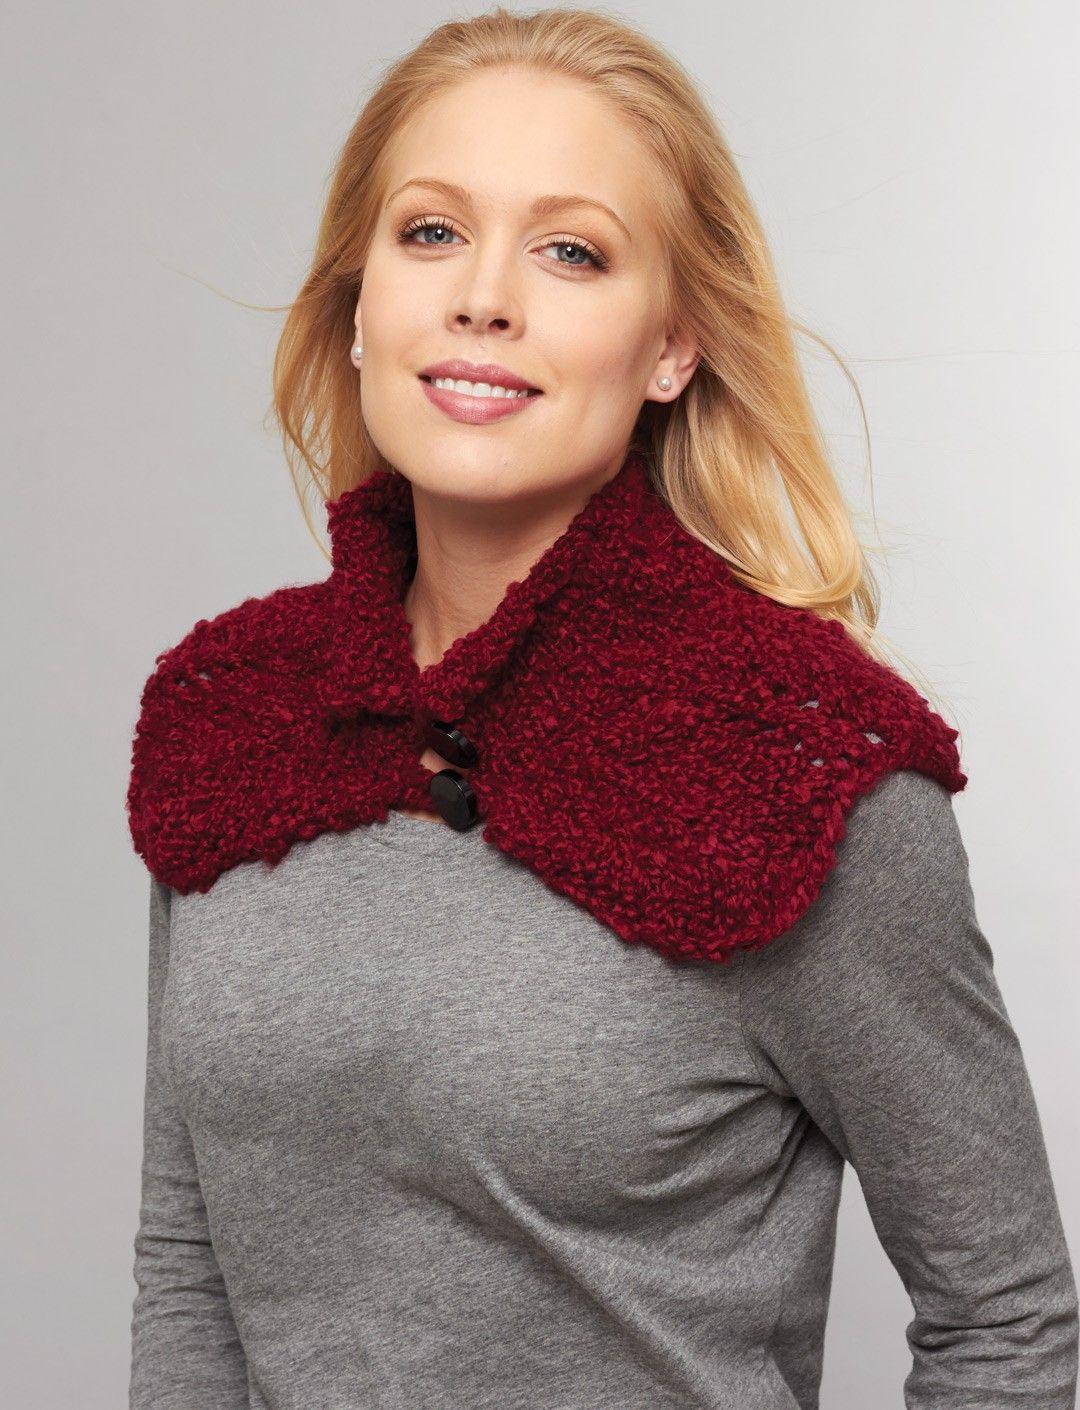 Yarnspirations.com - Bernat Buttoned Cowl to crochet - Patterns ...